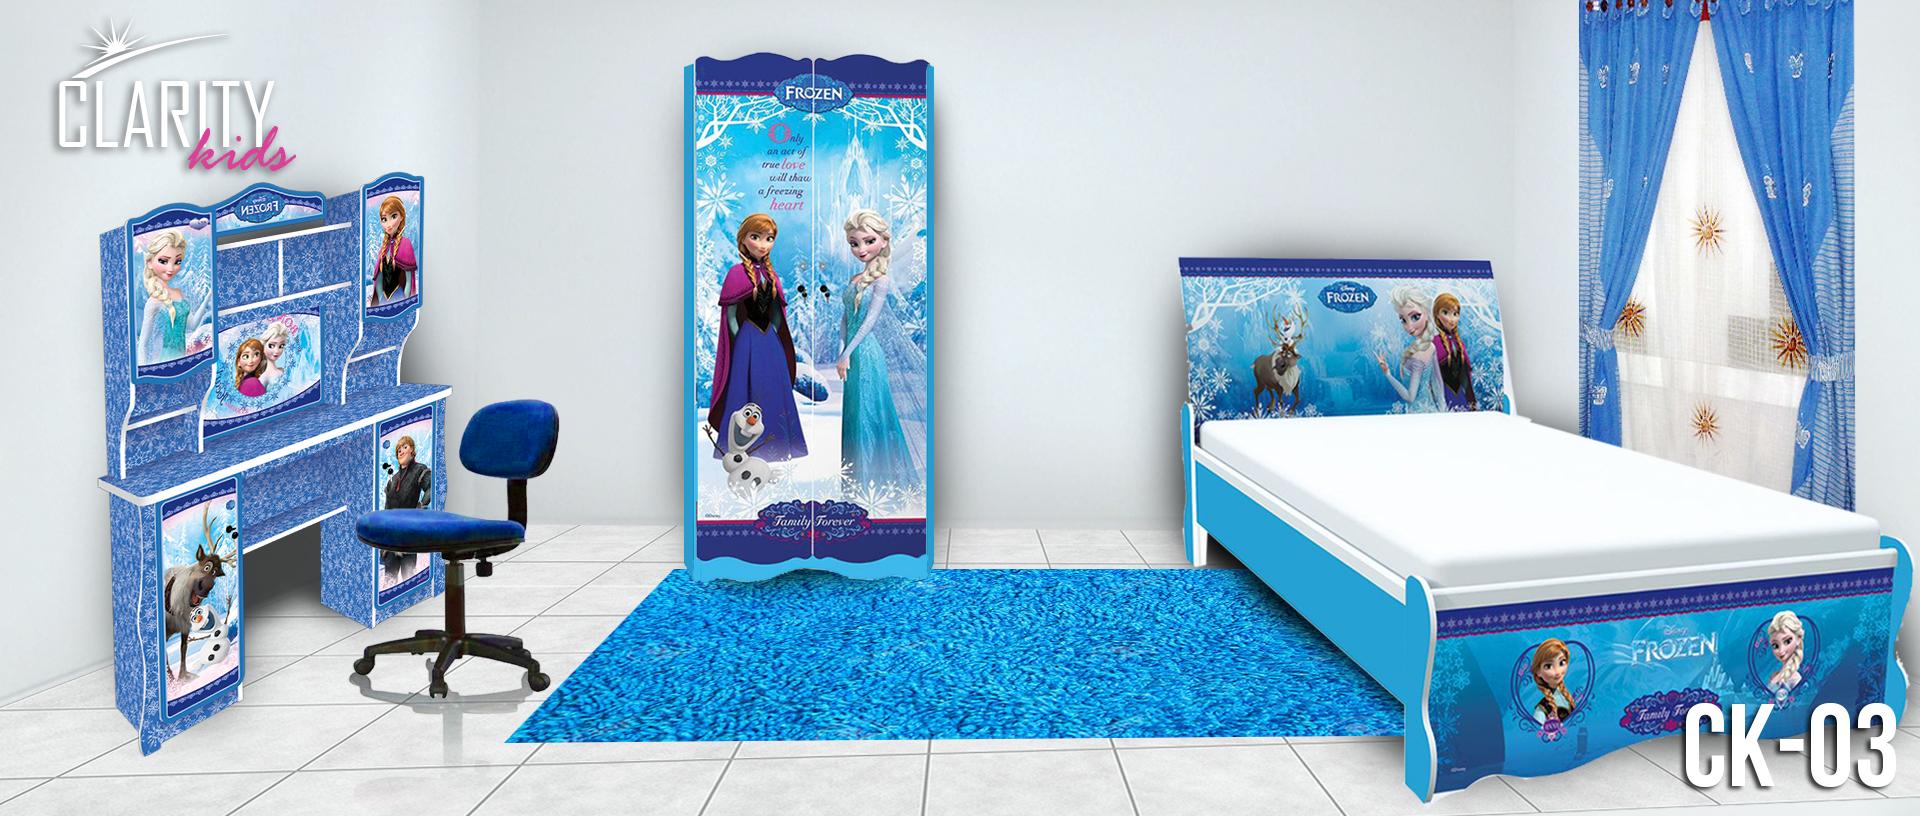 25 Kamar Tidur Anak Karakter Frozen Sisi Rumah Minimalis